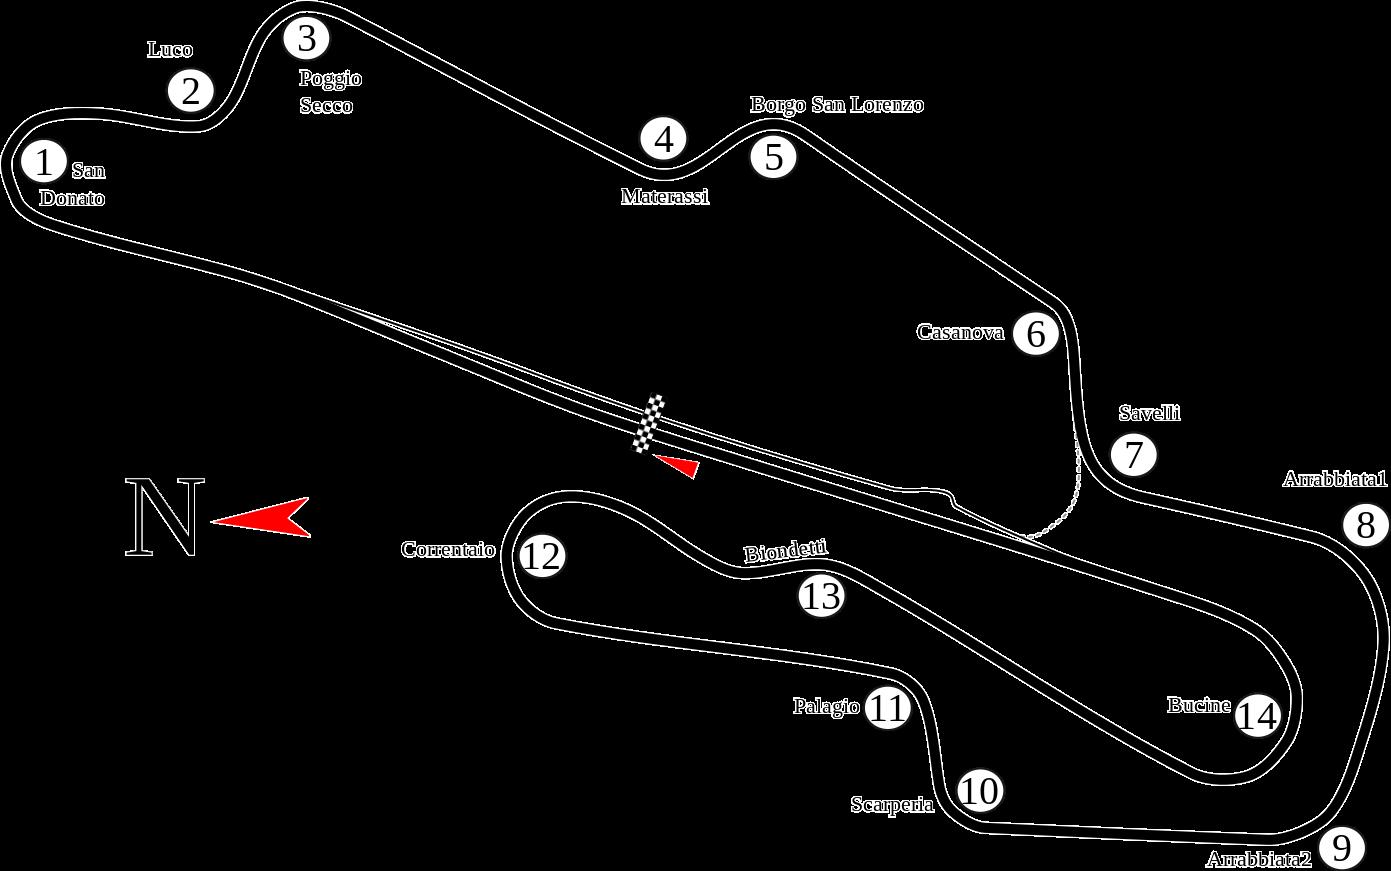 [Obrazek: 1391px-Mugello_Racing_Circuit_track_map.png]